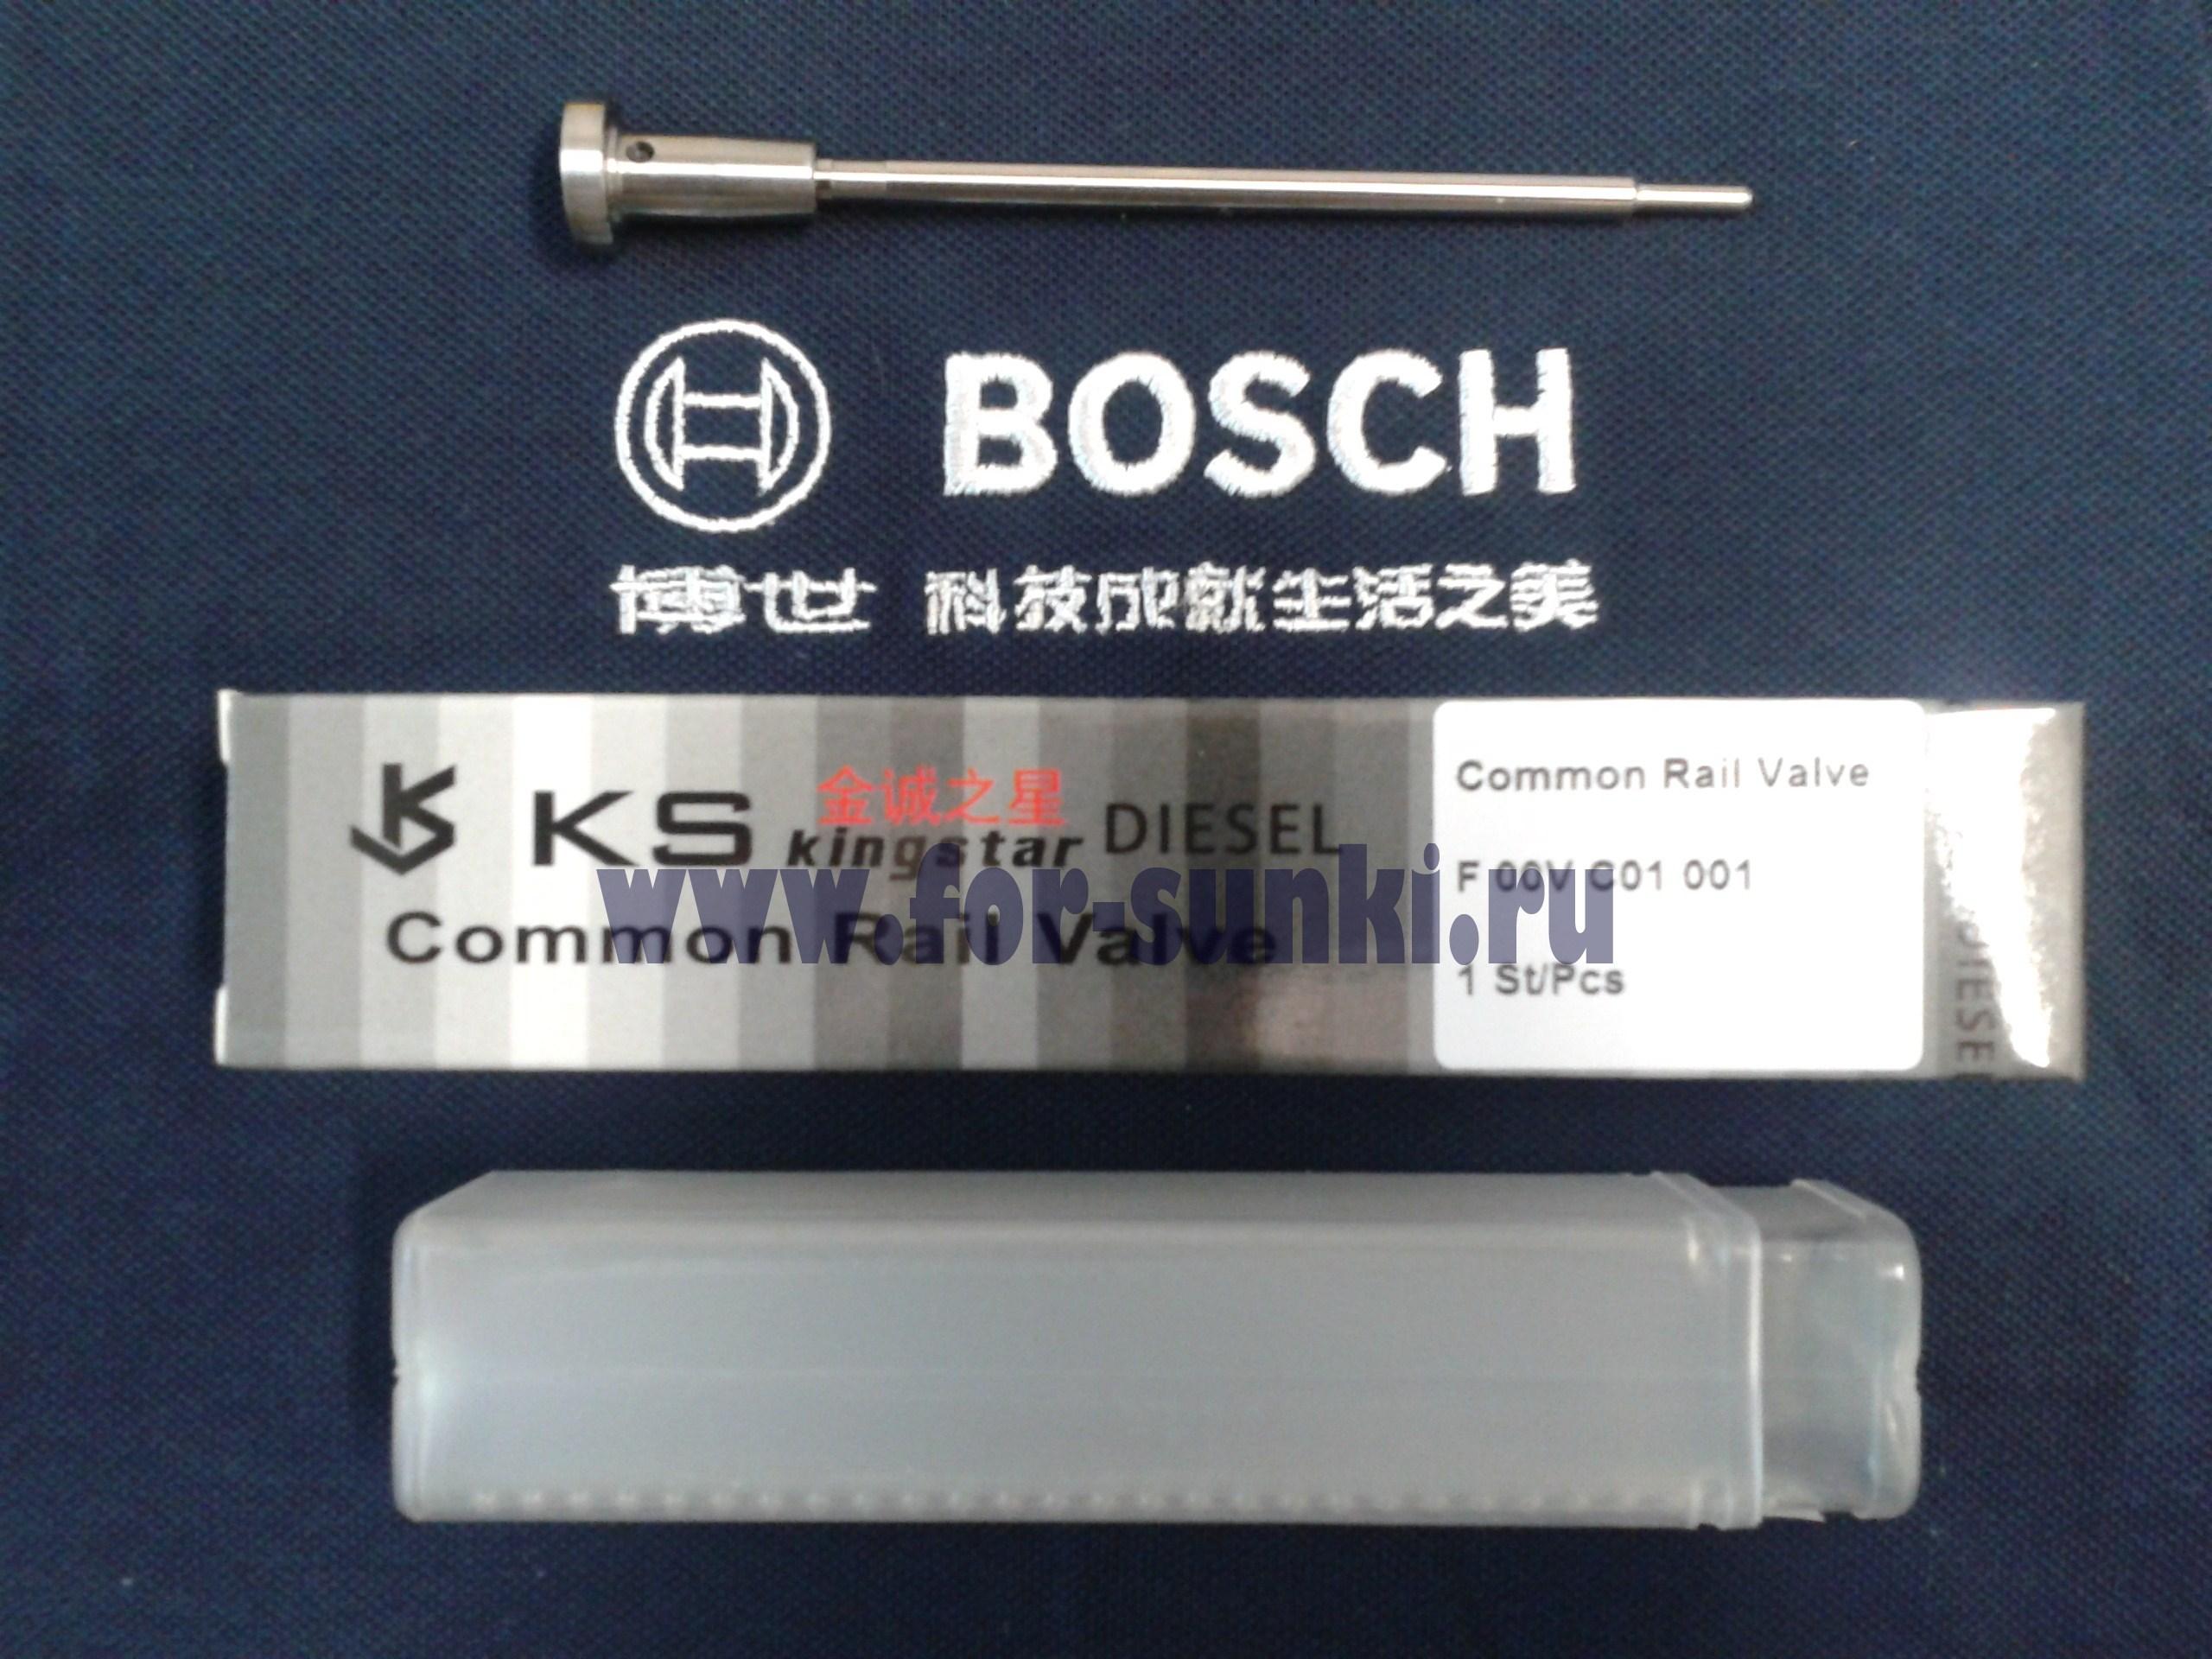 Клапан форсунки (БОШ, BOSCH) - F00VC01001 мерседес